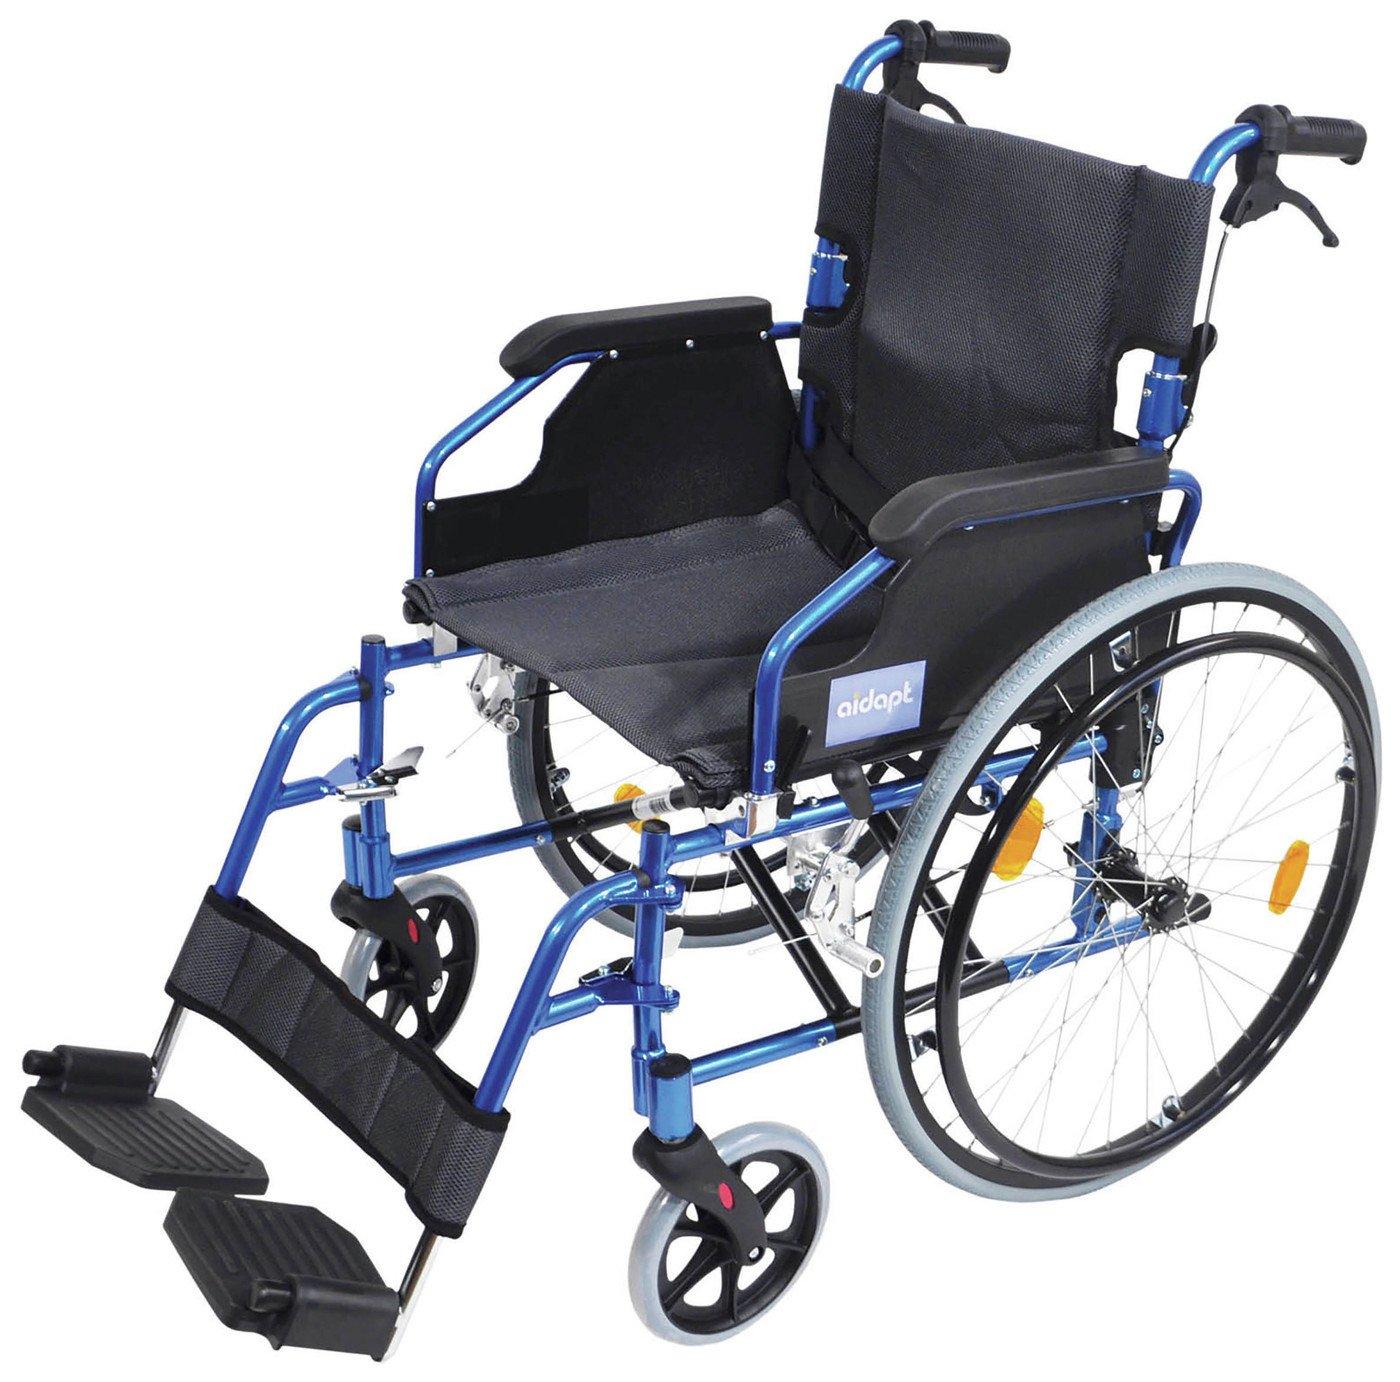 Aidapt Lightweight Self Propelled Aluminium Wheelchair- Blue